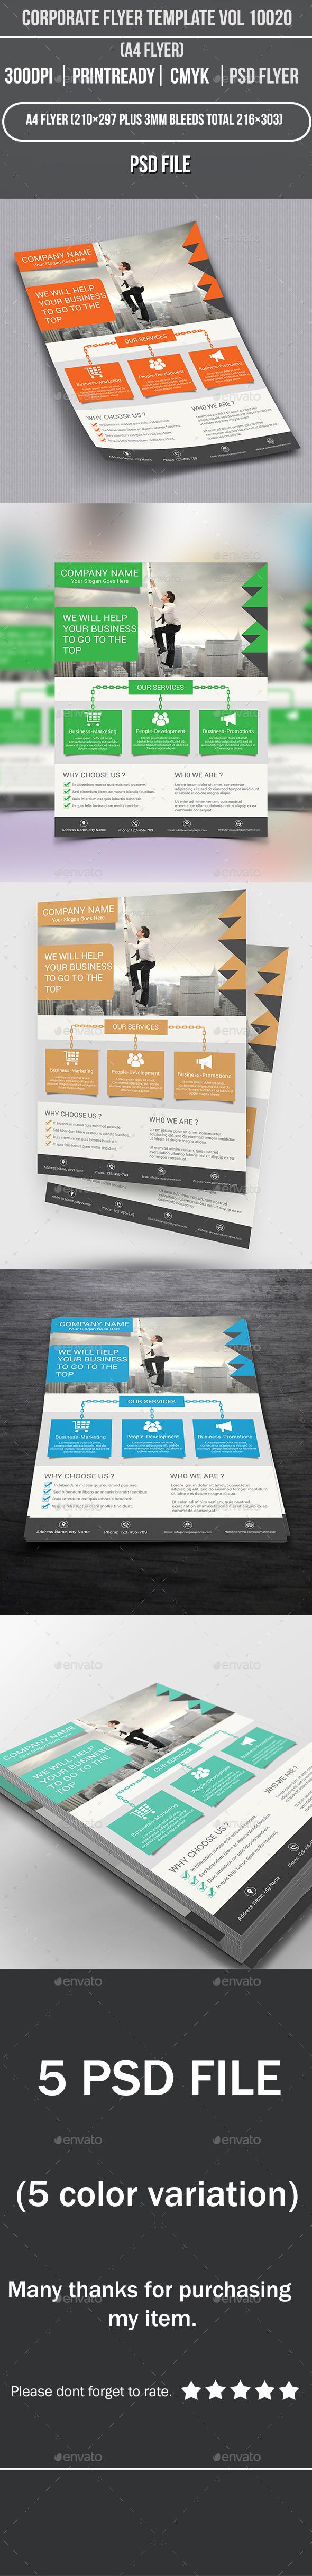 GraphicRiver Corporate Flyer Template Vol 10020 9079295